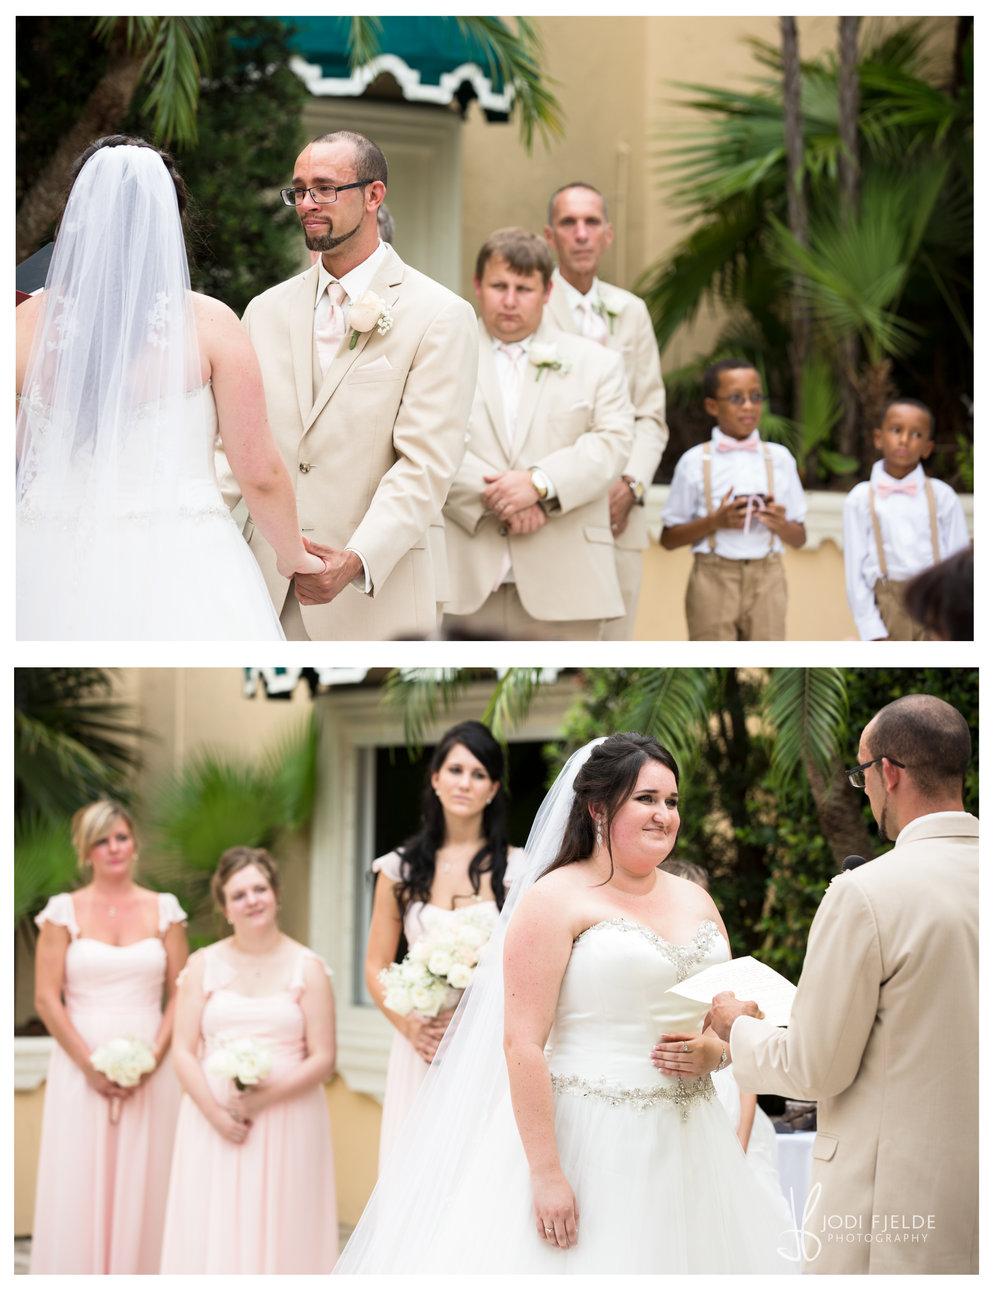 Benvenuto_Boynton Beach_ Wedding_Emily_&_Shawn 17.jpg